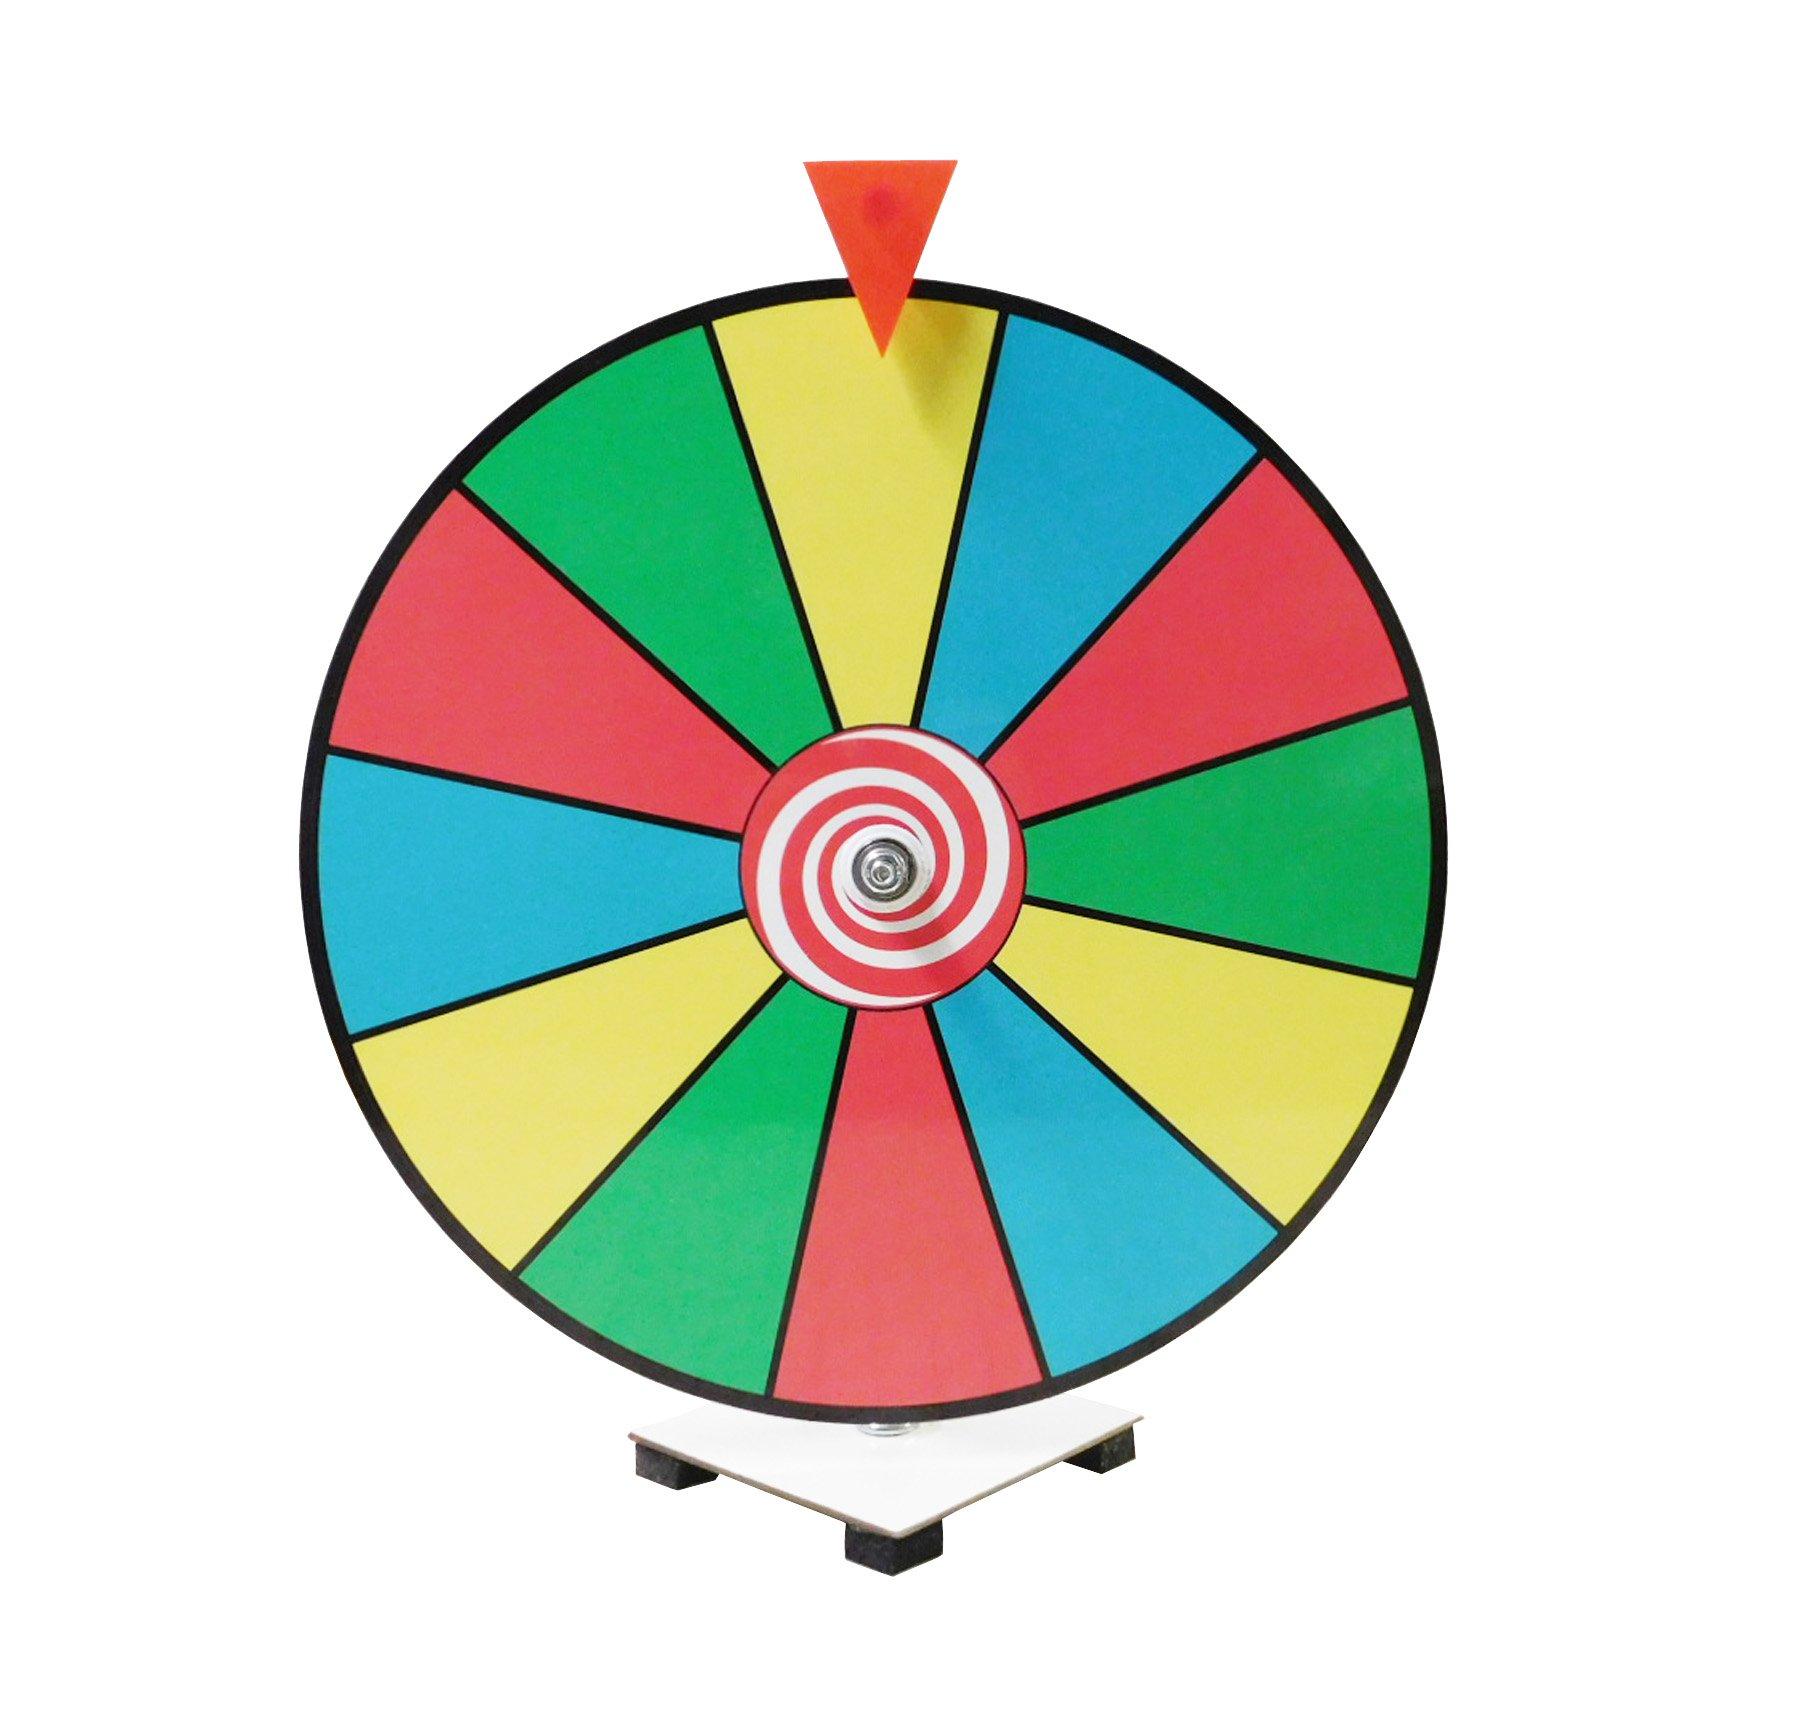 16 Inch Dry Erase Spinning Prize Wheel